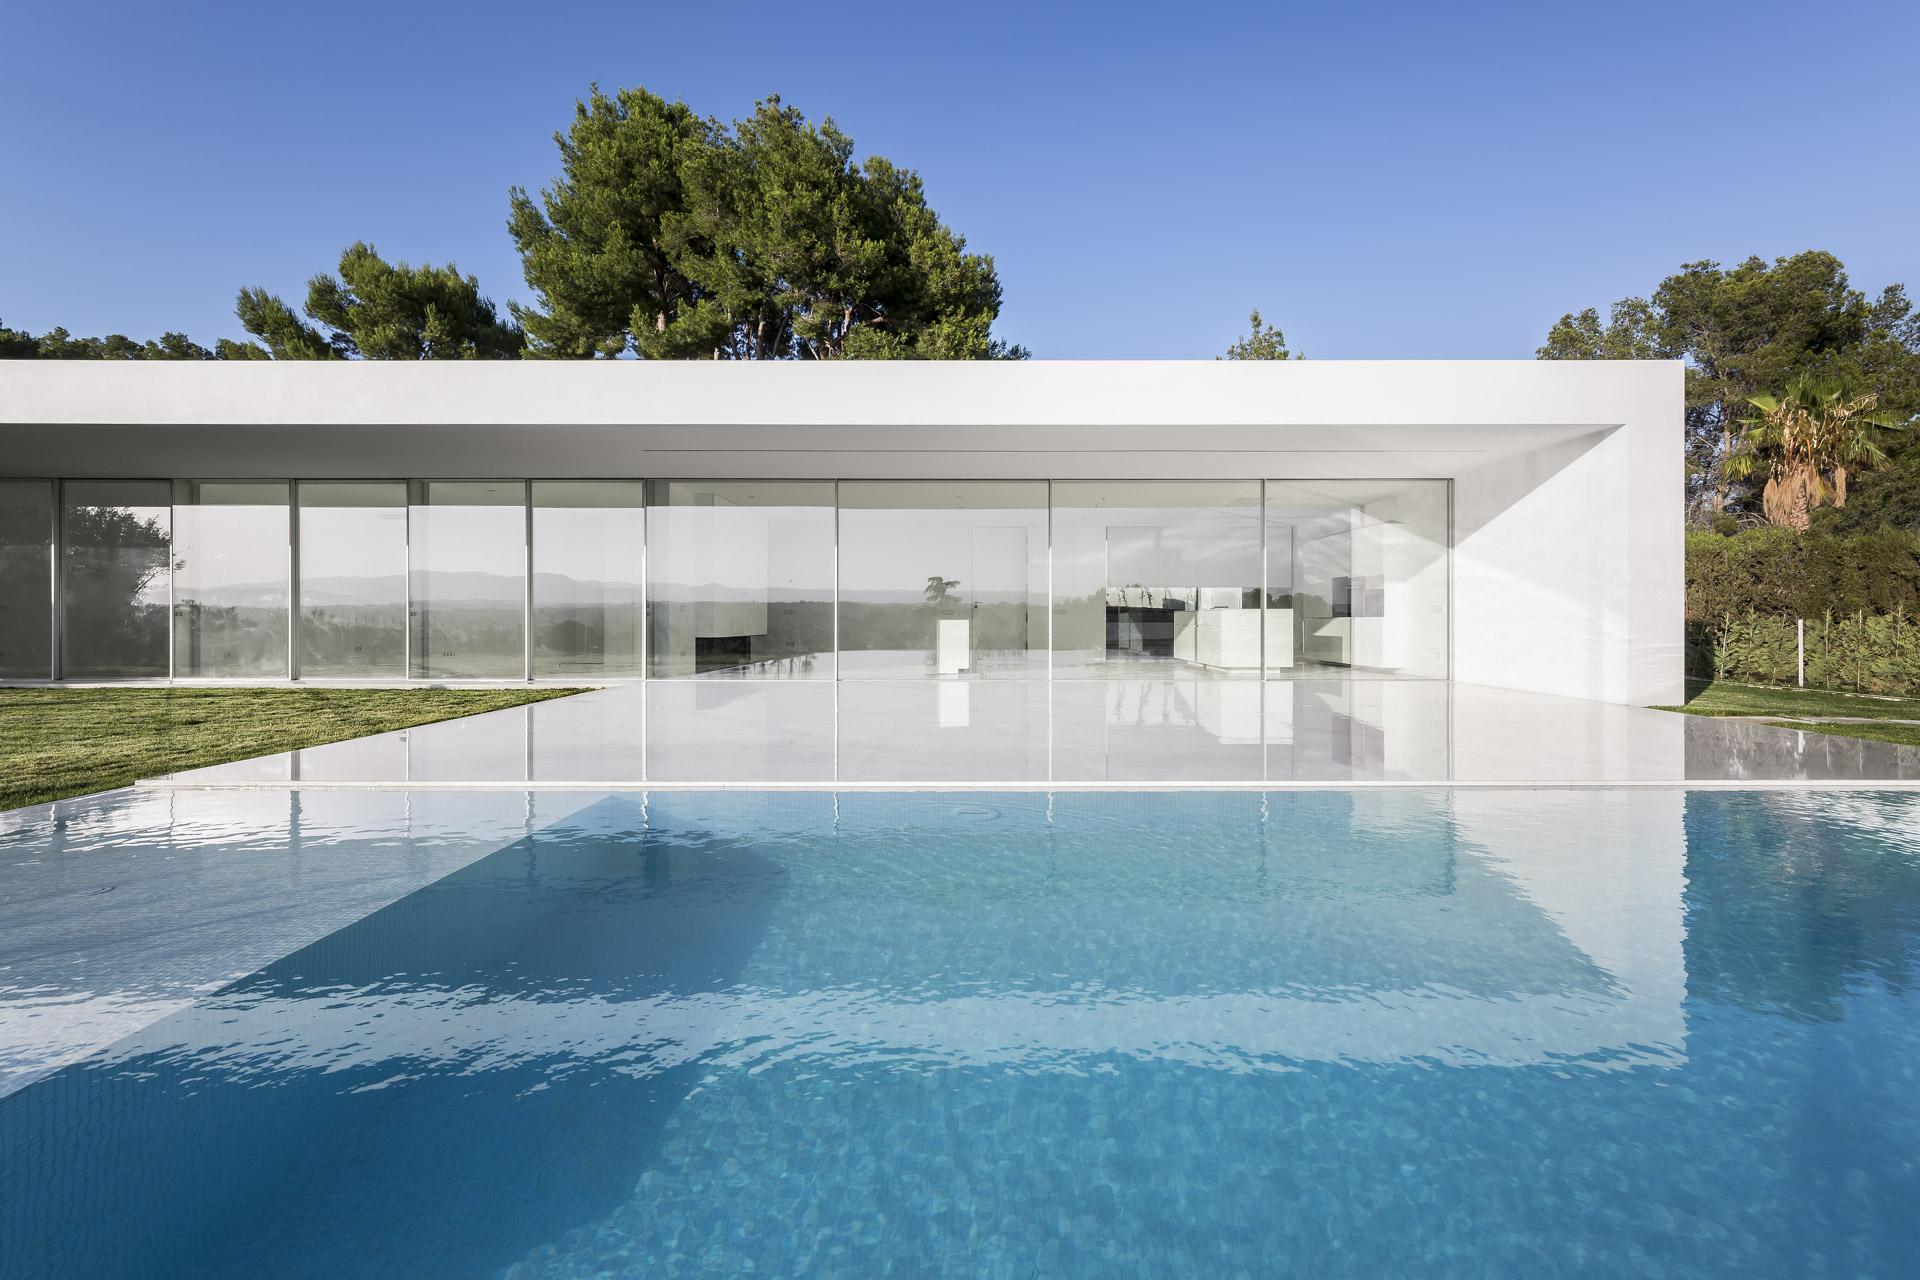 fotografia-arquitectura-valencia-german-cabo-gallardo-llopis-villamarchante-vivienda-44